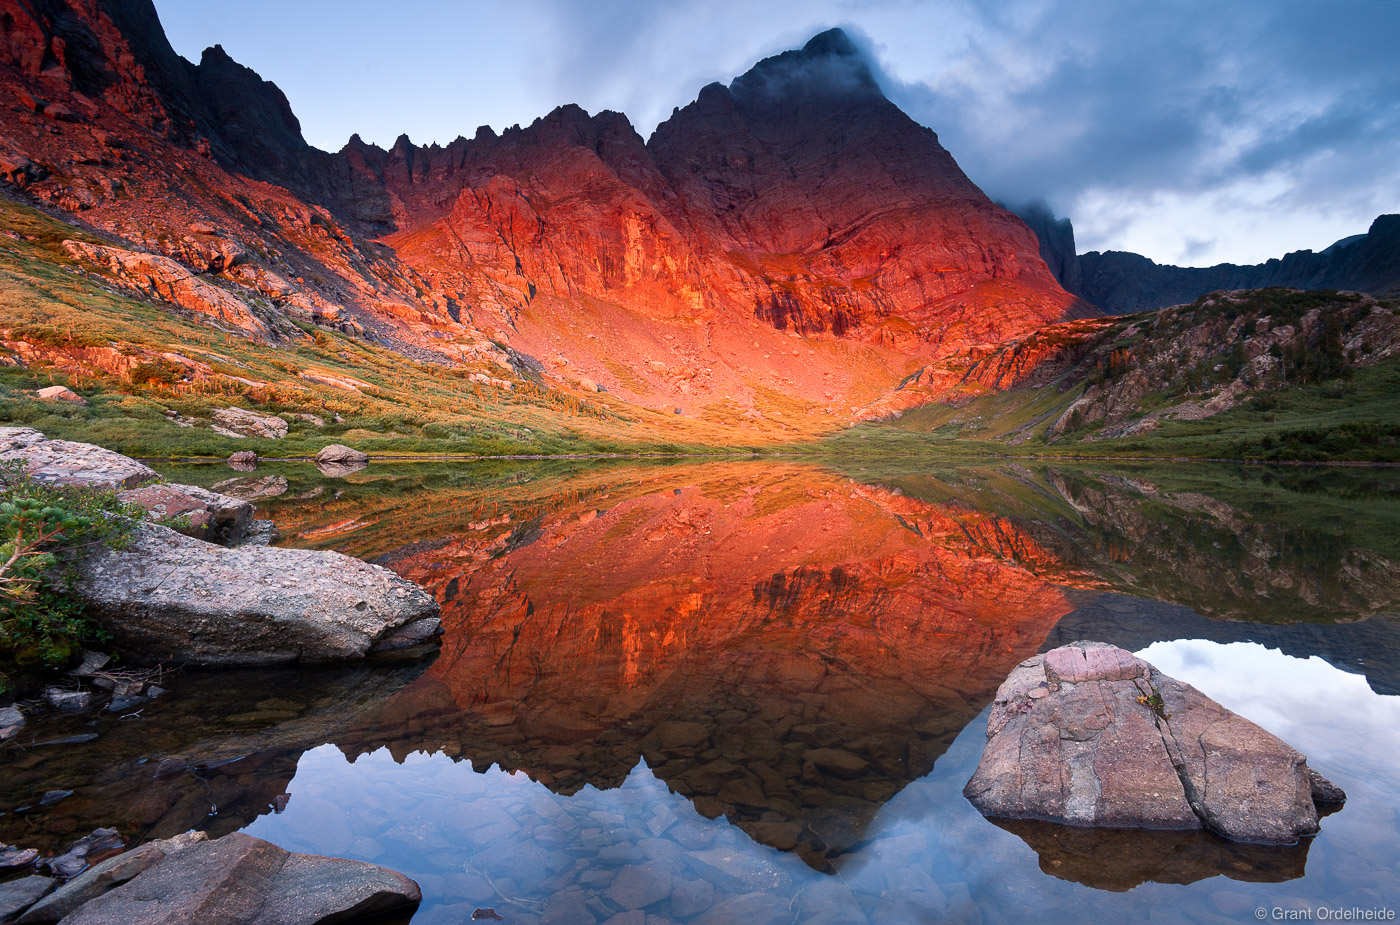 crestone, needle, sangre de cristo, colorado, red, sunrise, dramatic, fourteen, thousand, foot, peaks, south, colony, la, photo